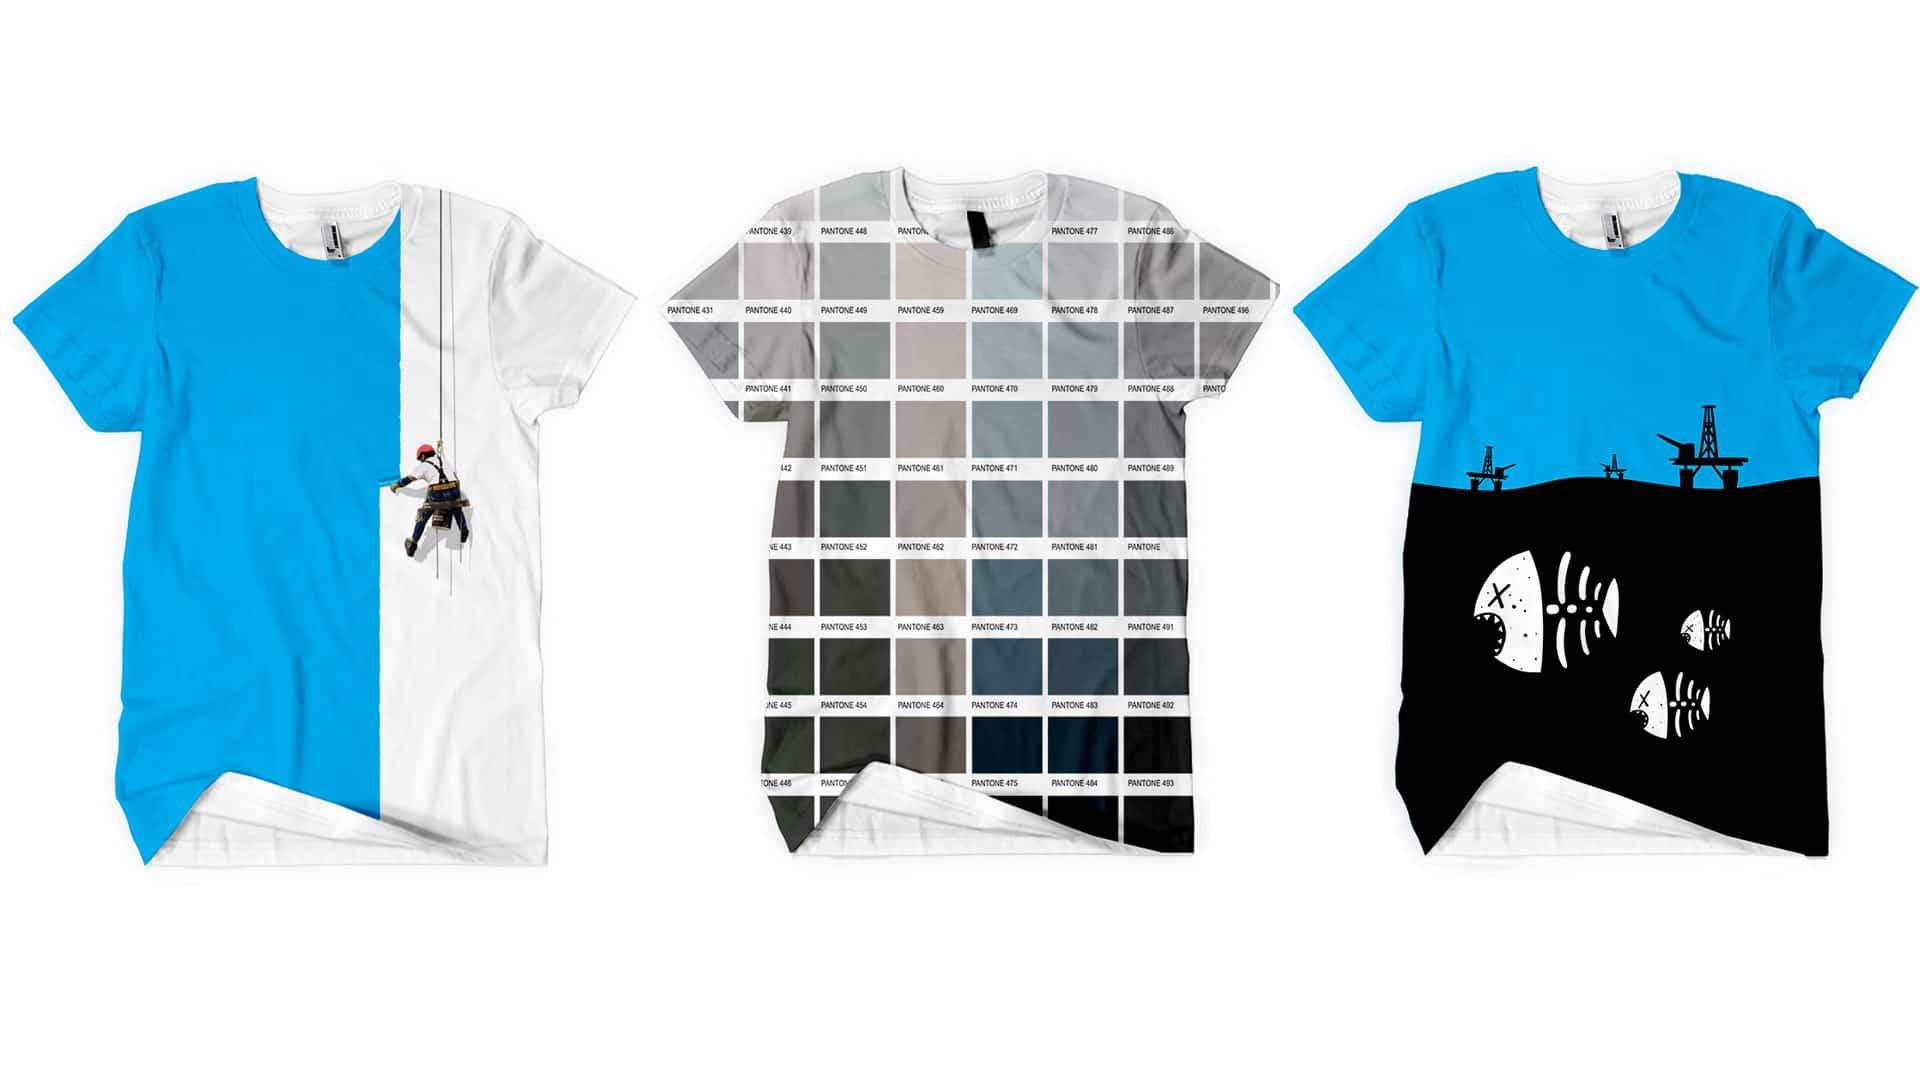 Best Creative Tshirt Designs on Earth